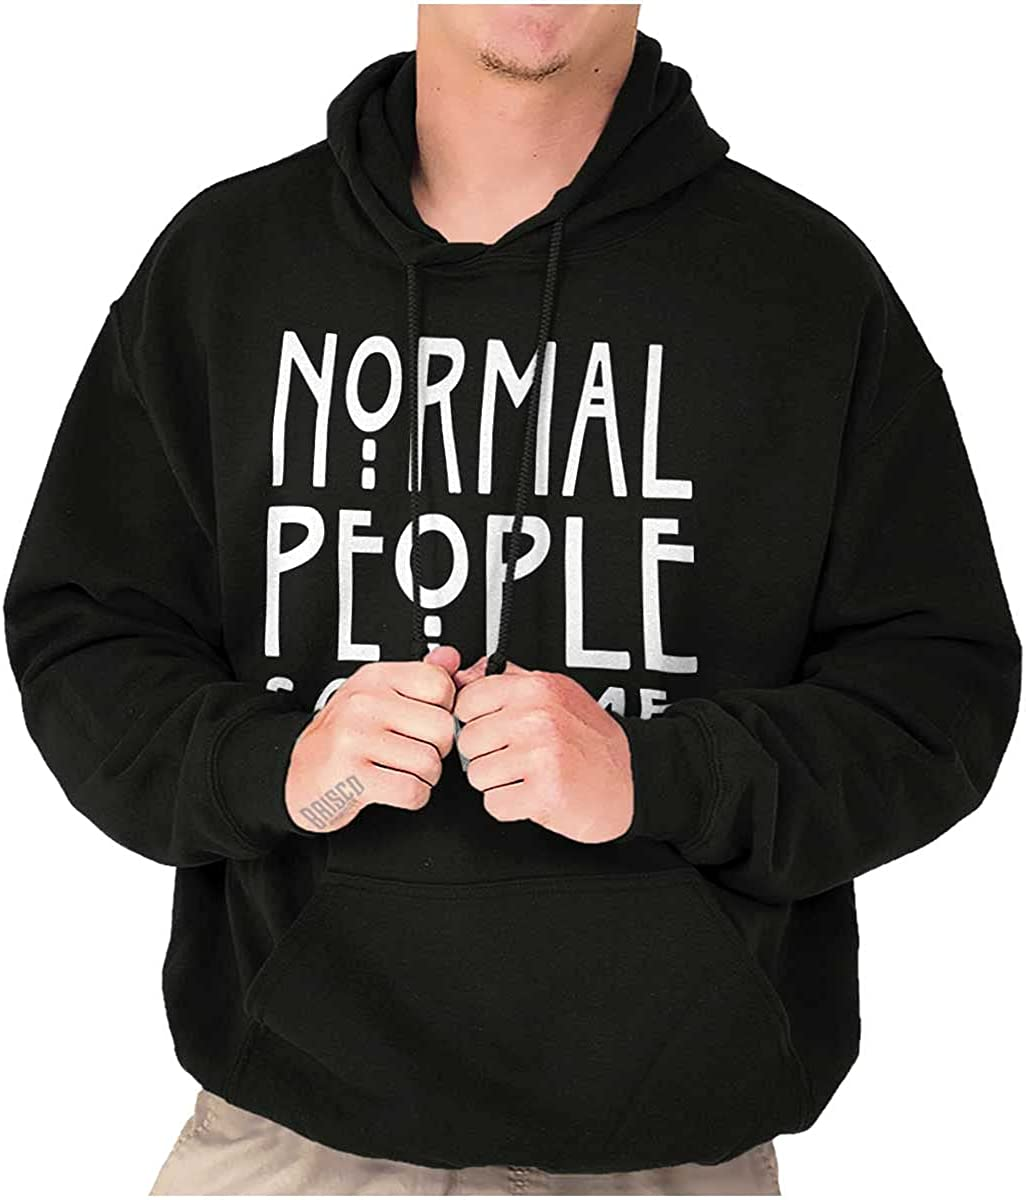 Max 79% OFF Normal People Scare Me Tales Sweatshirt Horror Men Max 80% OFF Hoodie Women